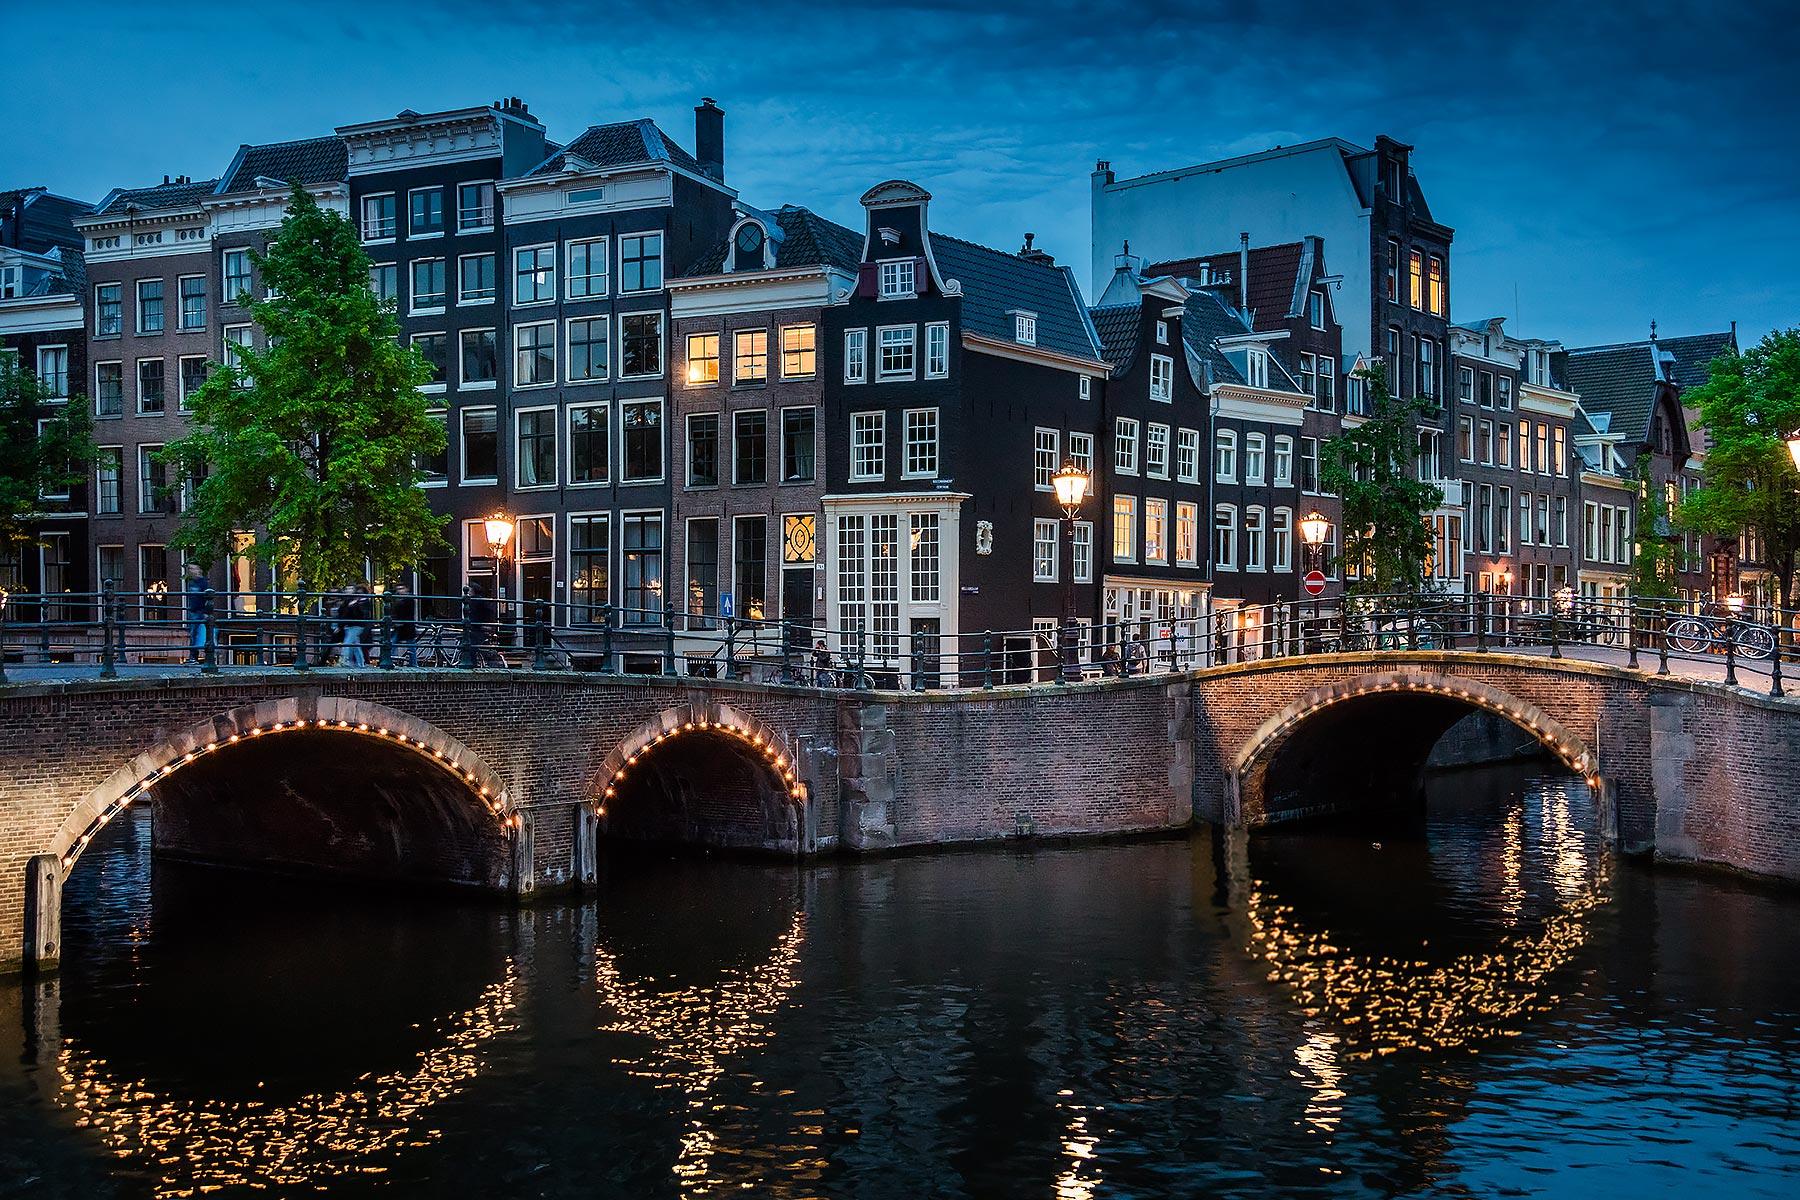 amsterdambridge.jpg